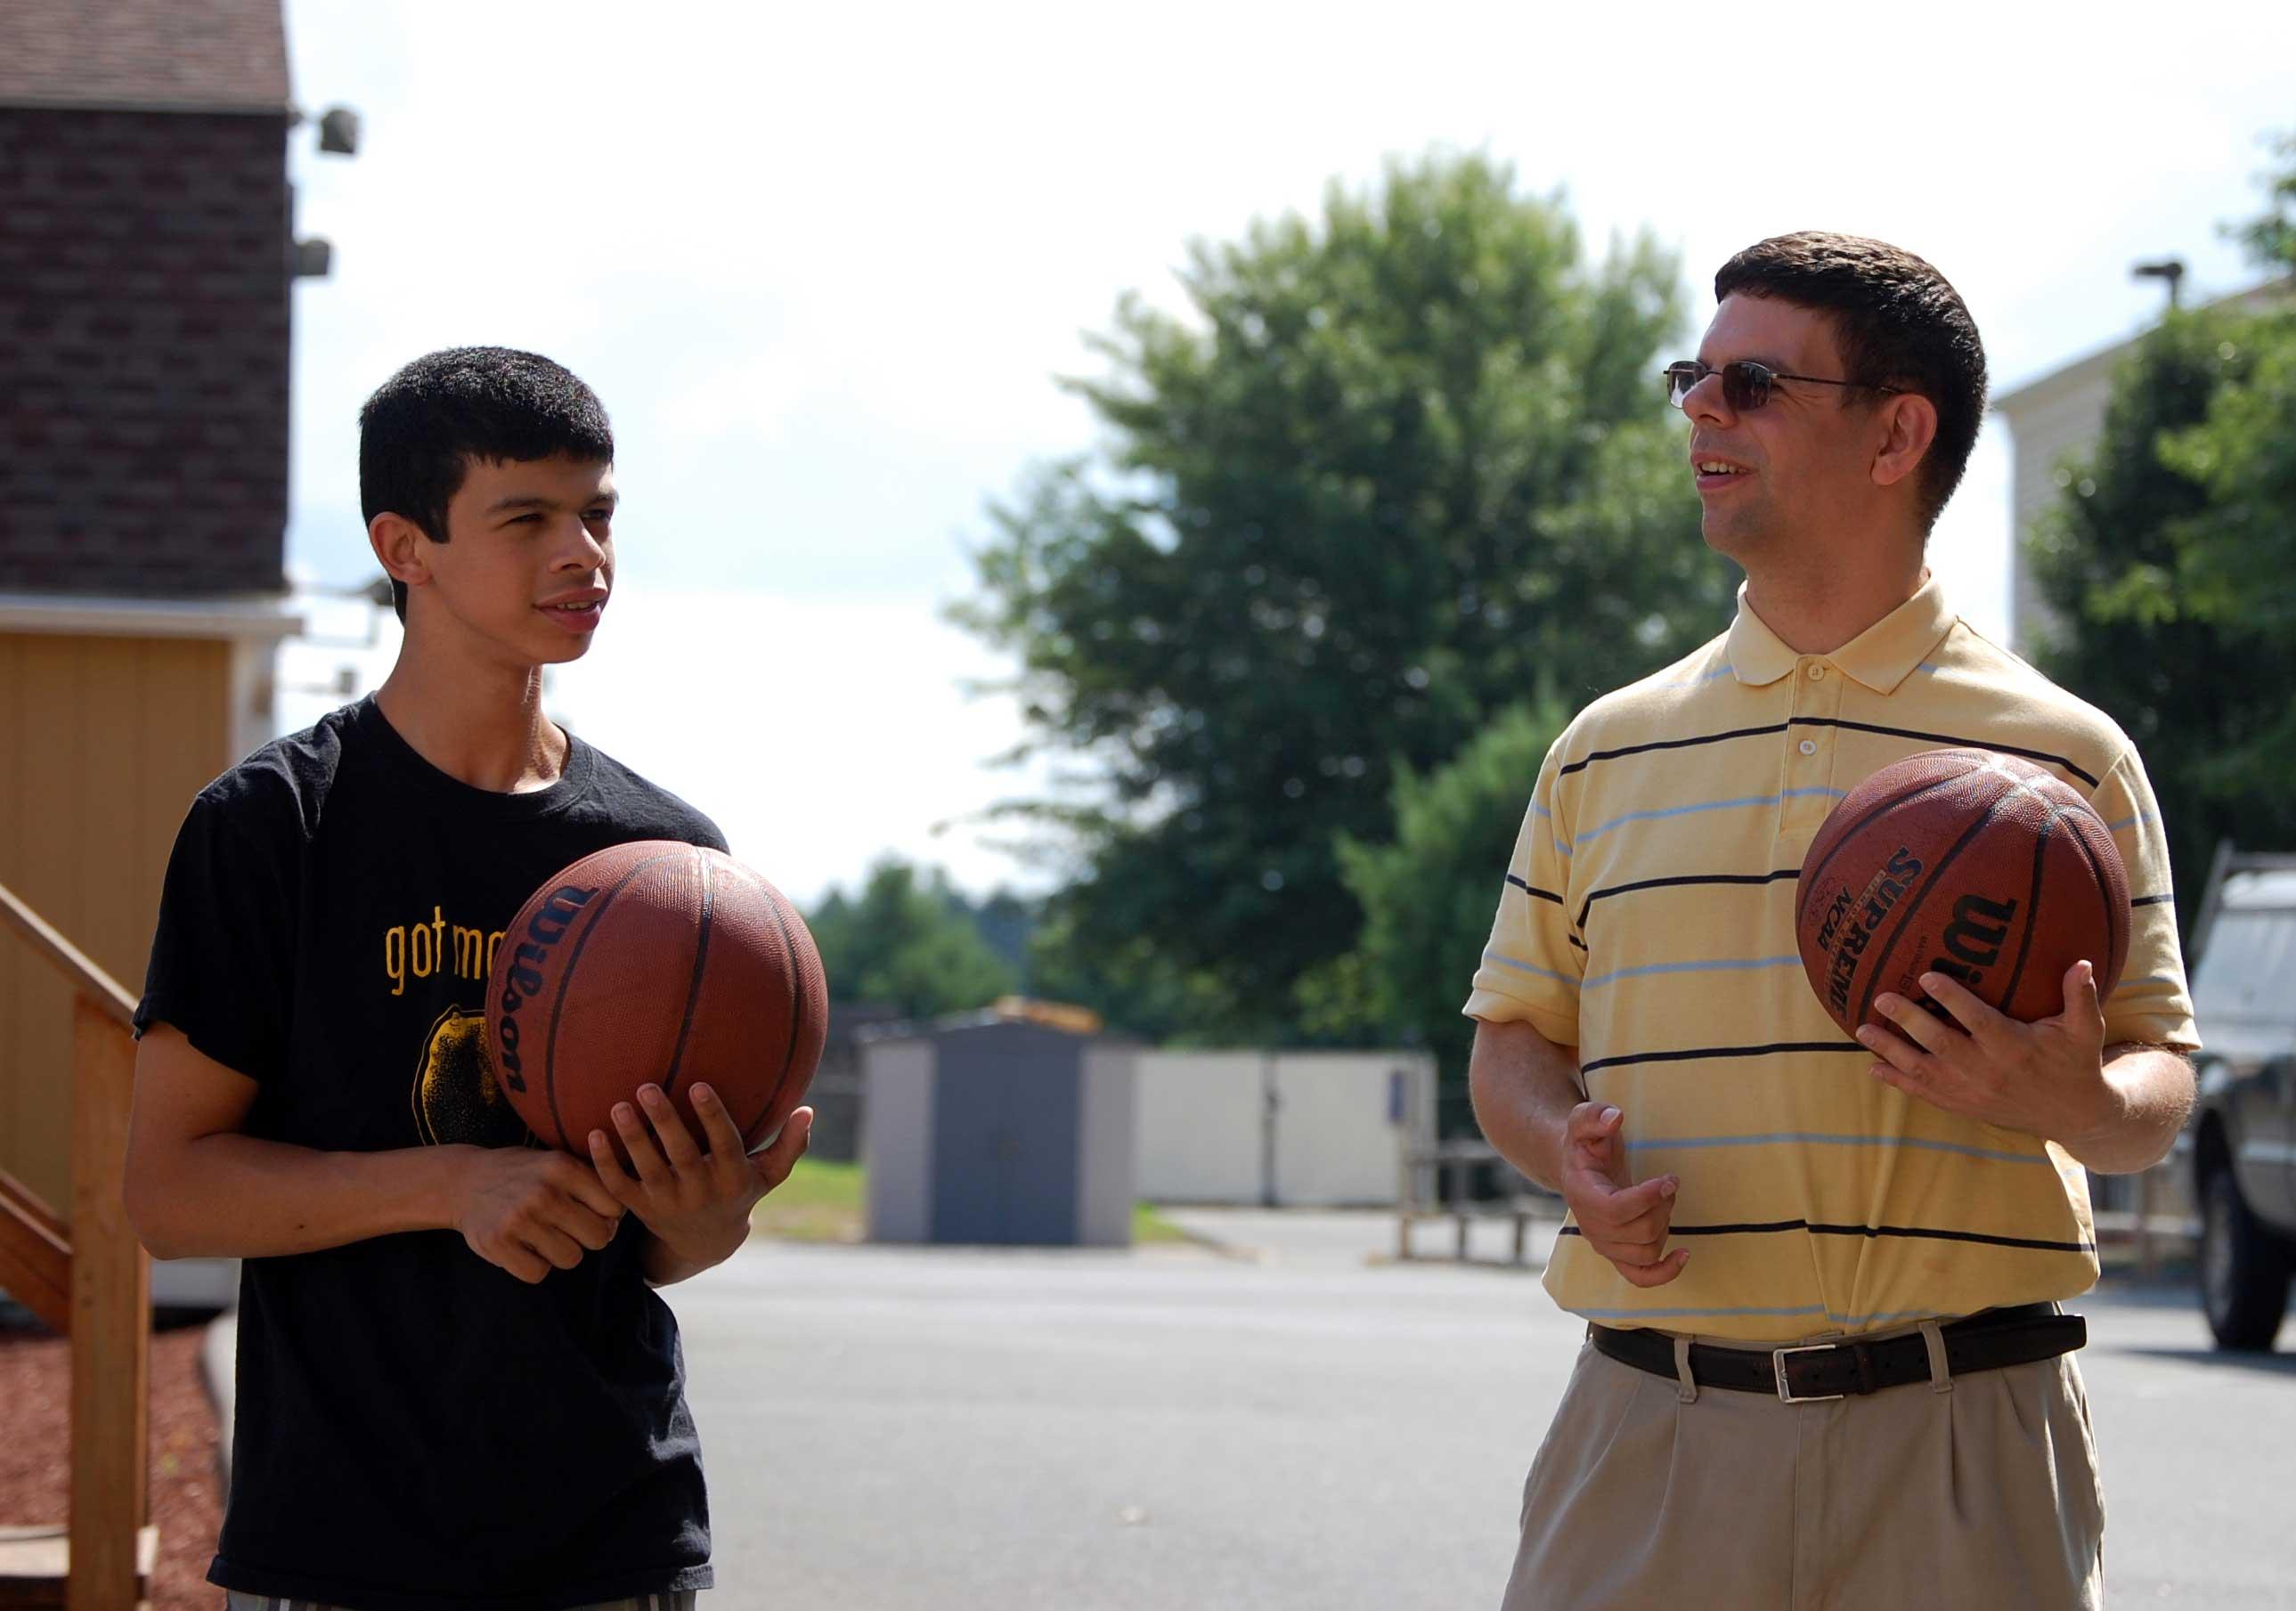 Alex-John-Transitioners-Basketball